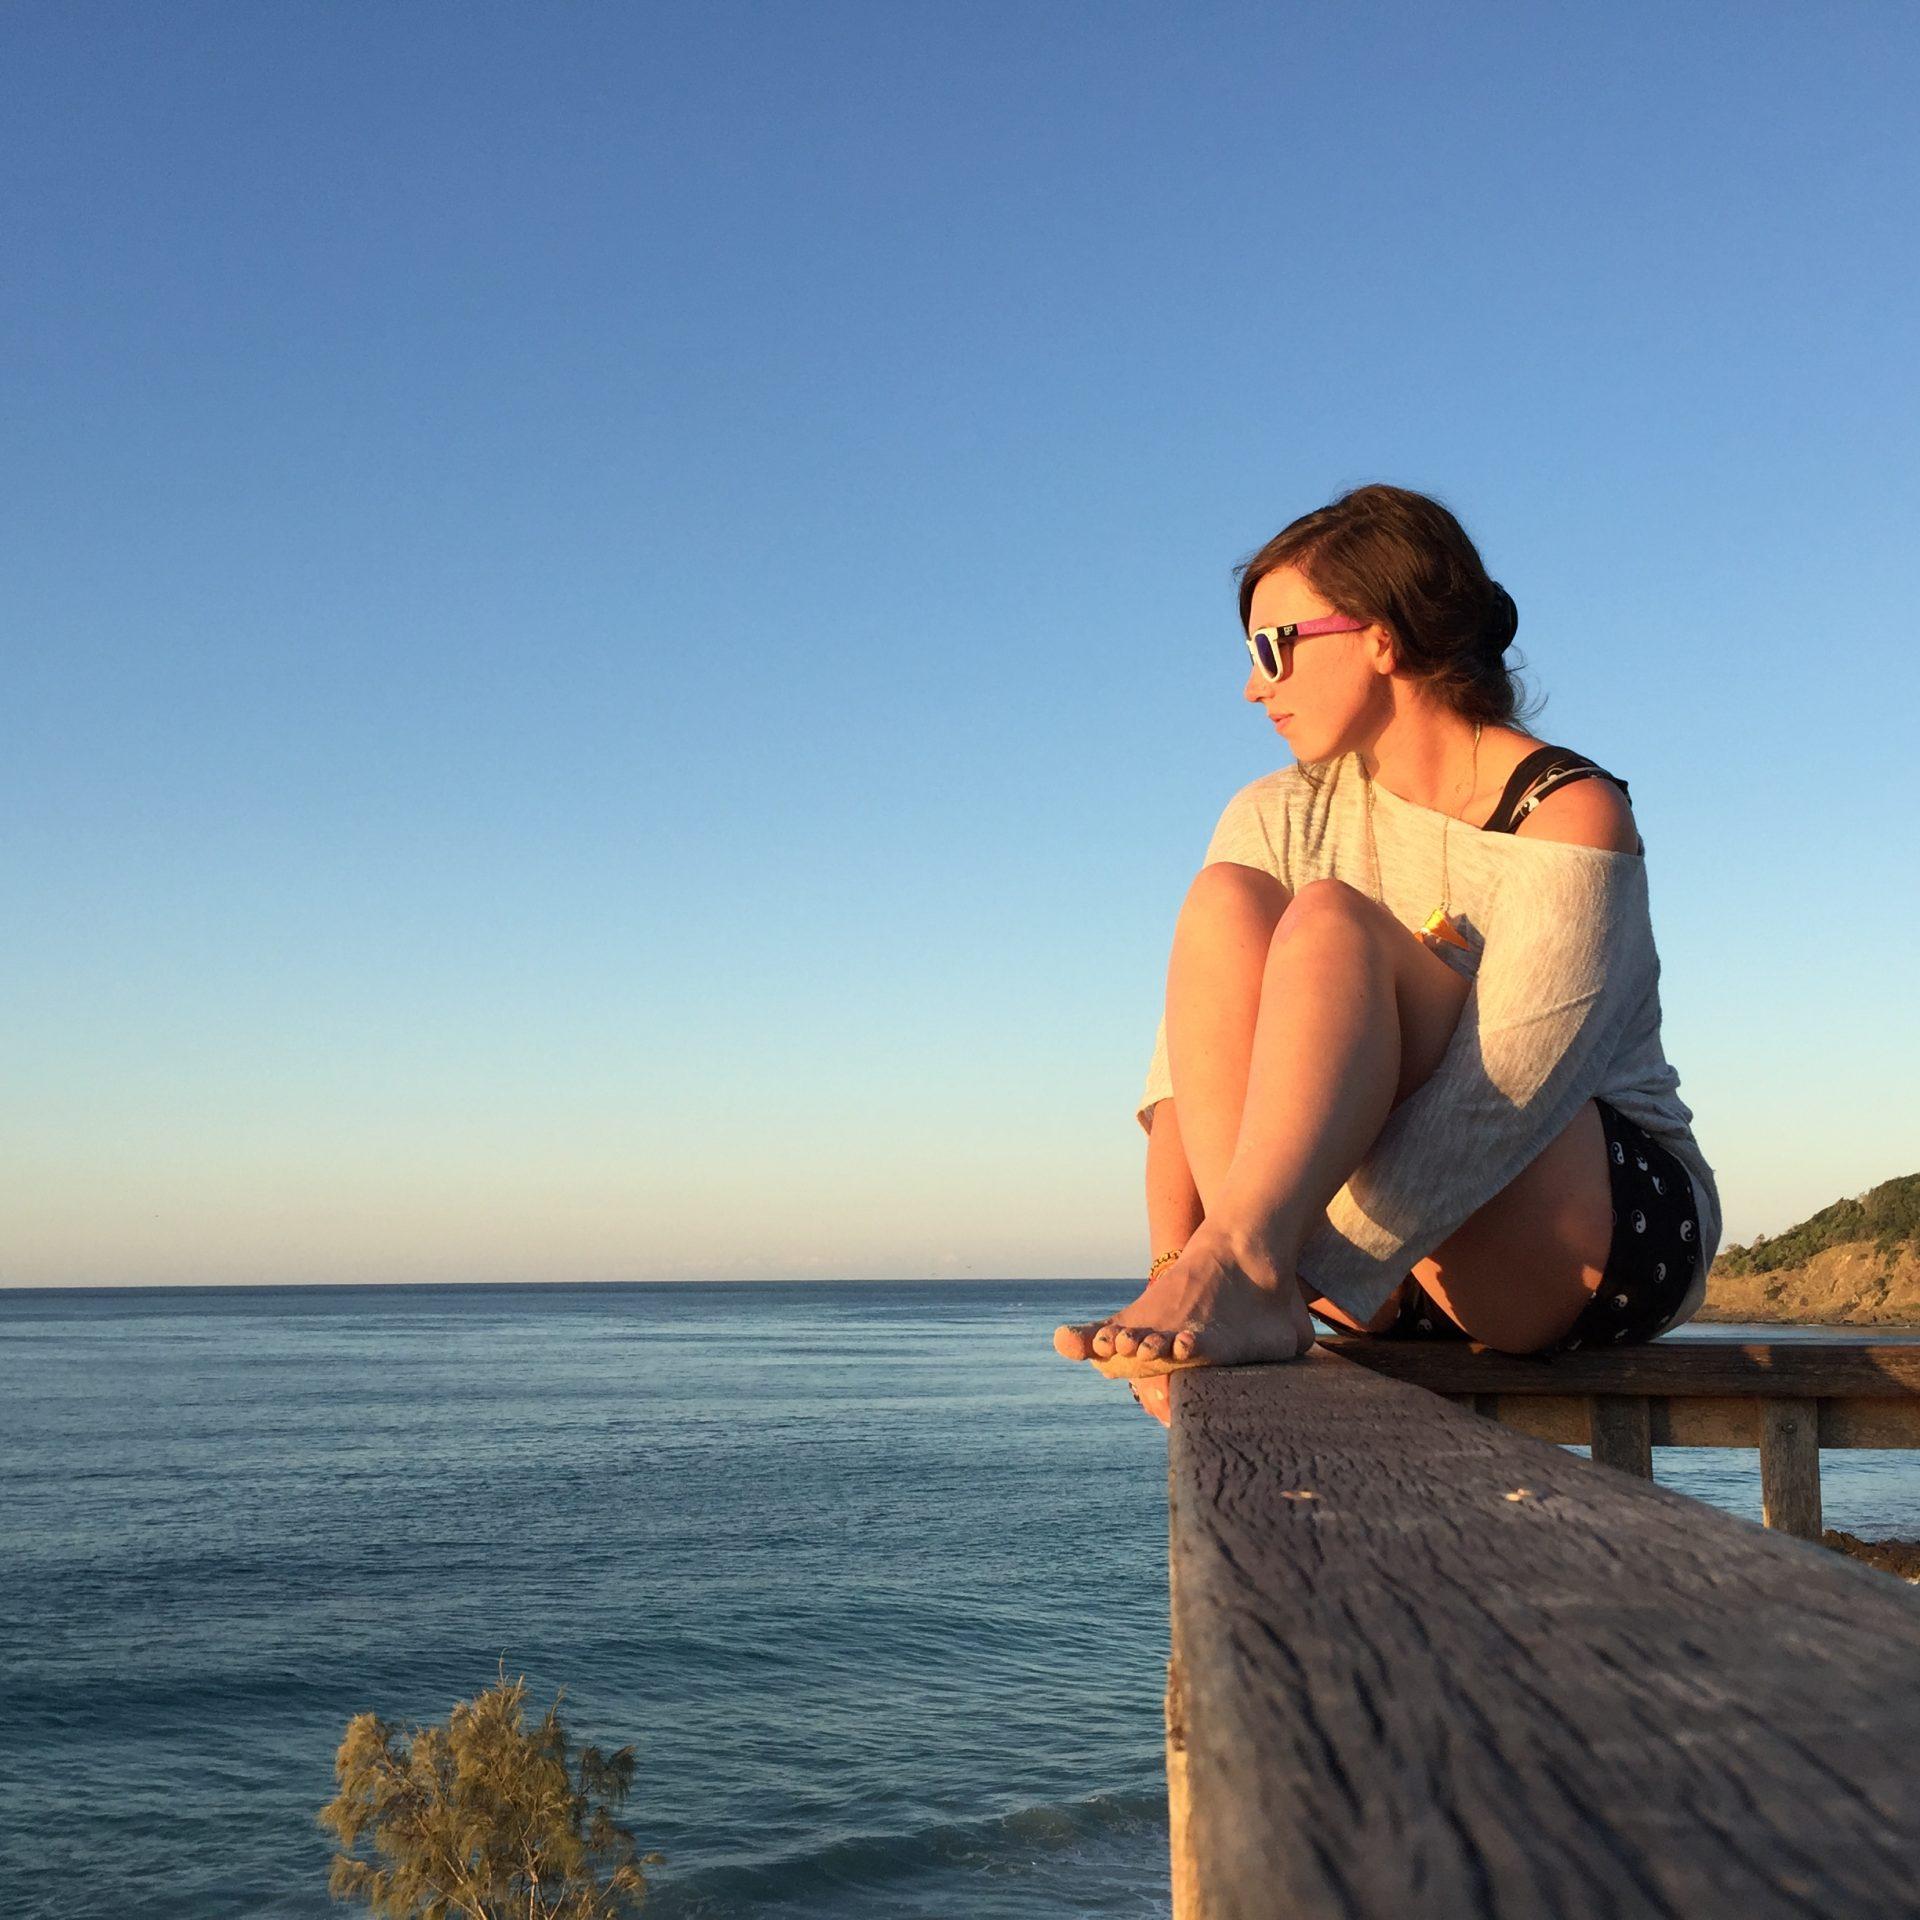 solo female travel backpacker worries fears